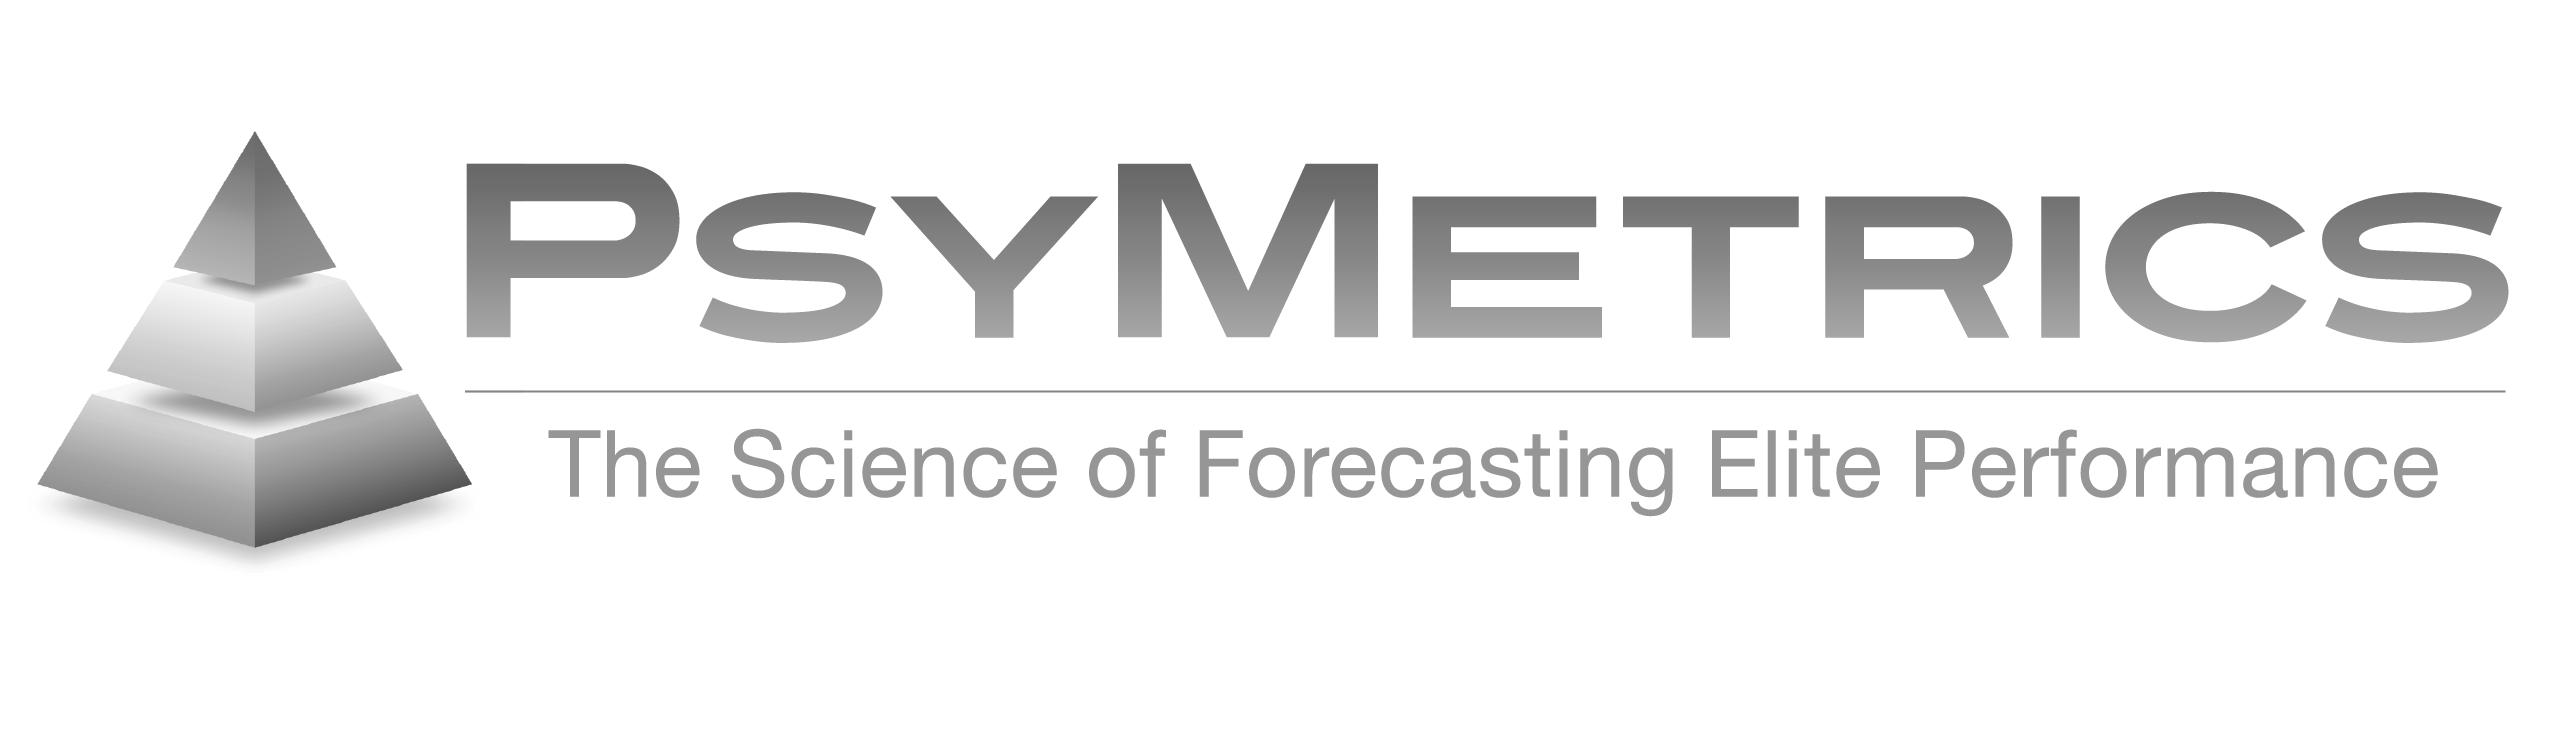 PsymetricsLogoFINAL Grey